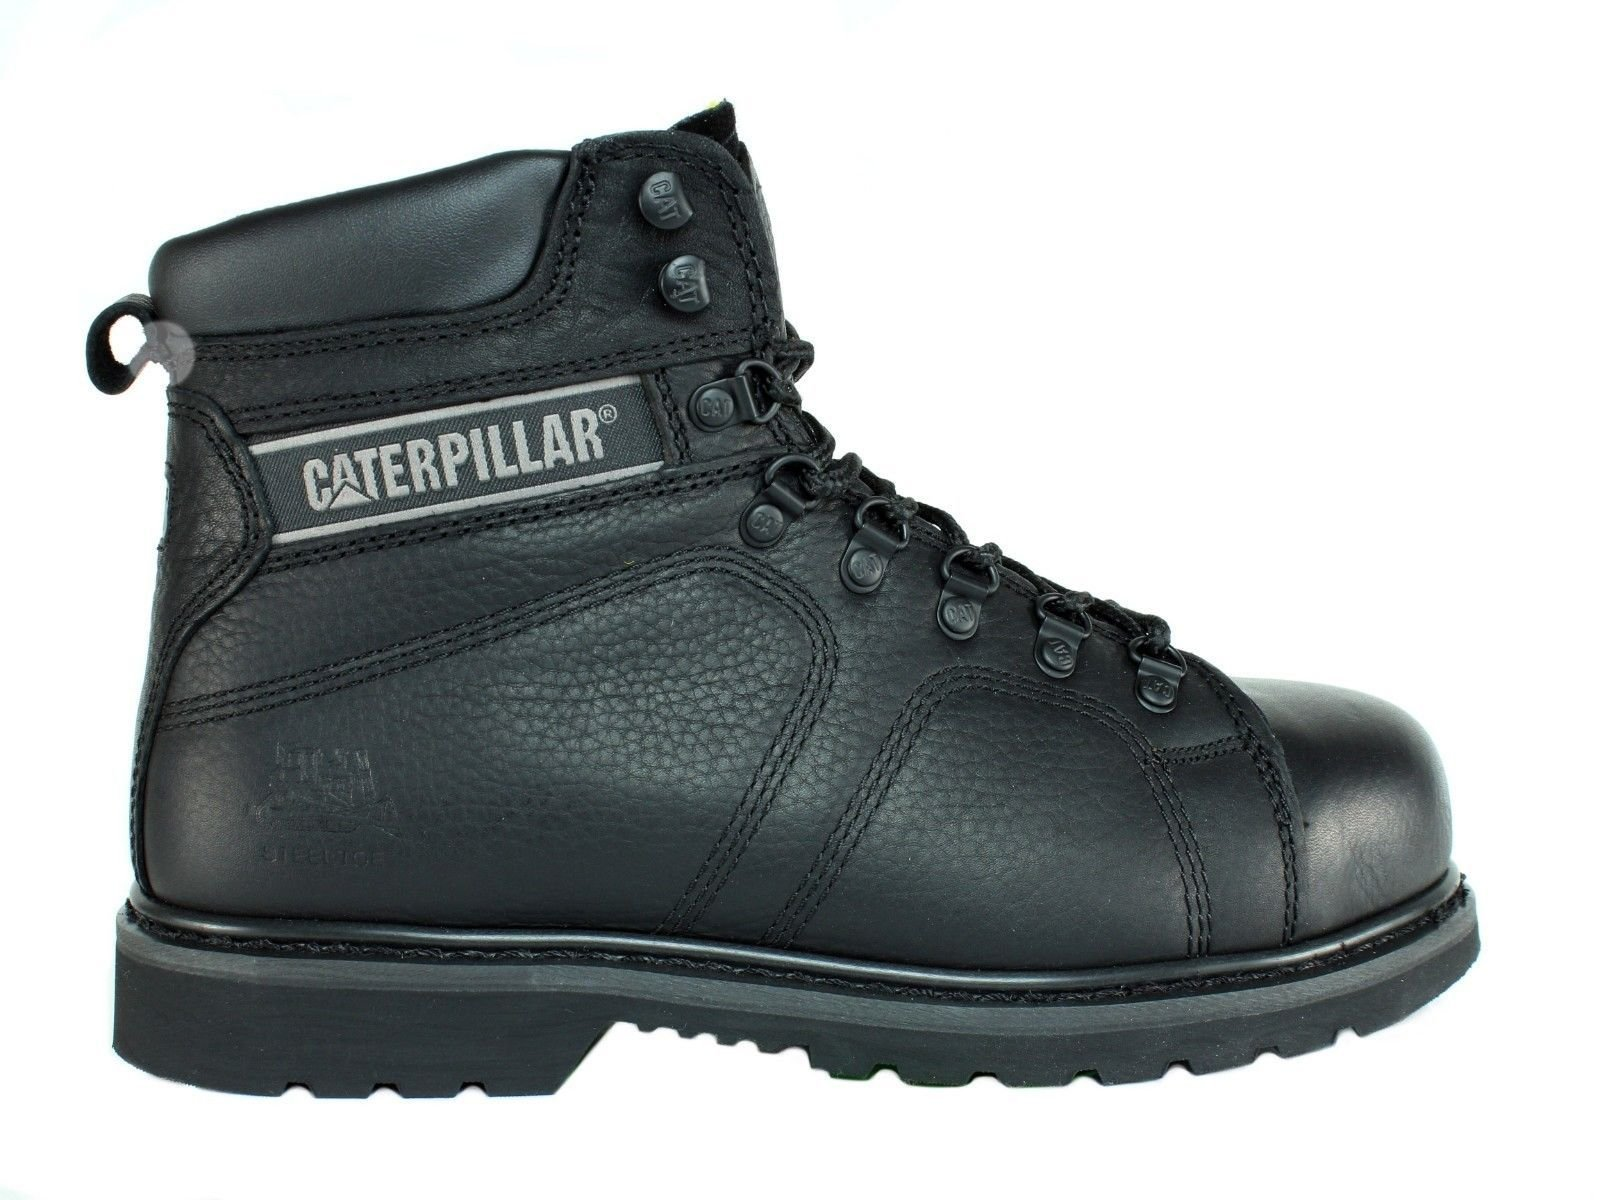 Caterpillar SureGrip Mens Silverton SG Black Slip Resistant Work Boots 12M by Caterpillar (Image #2)